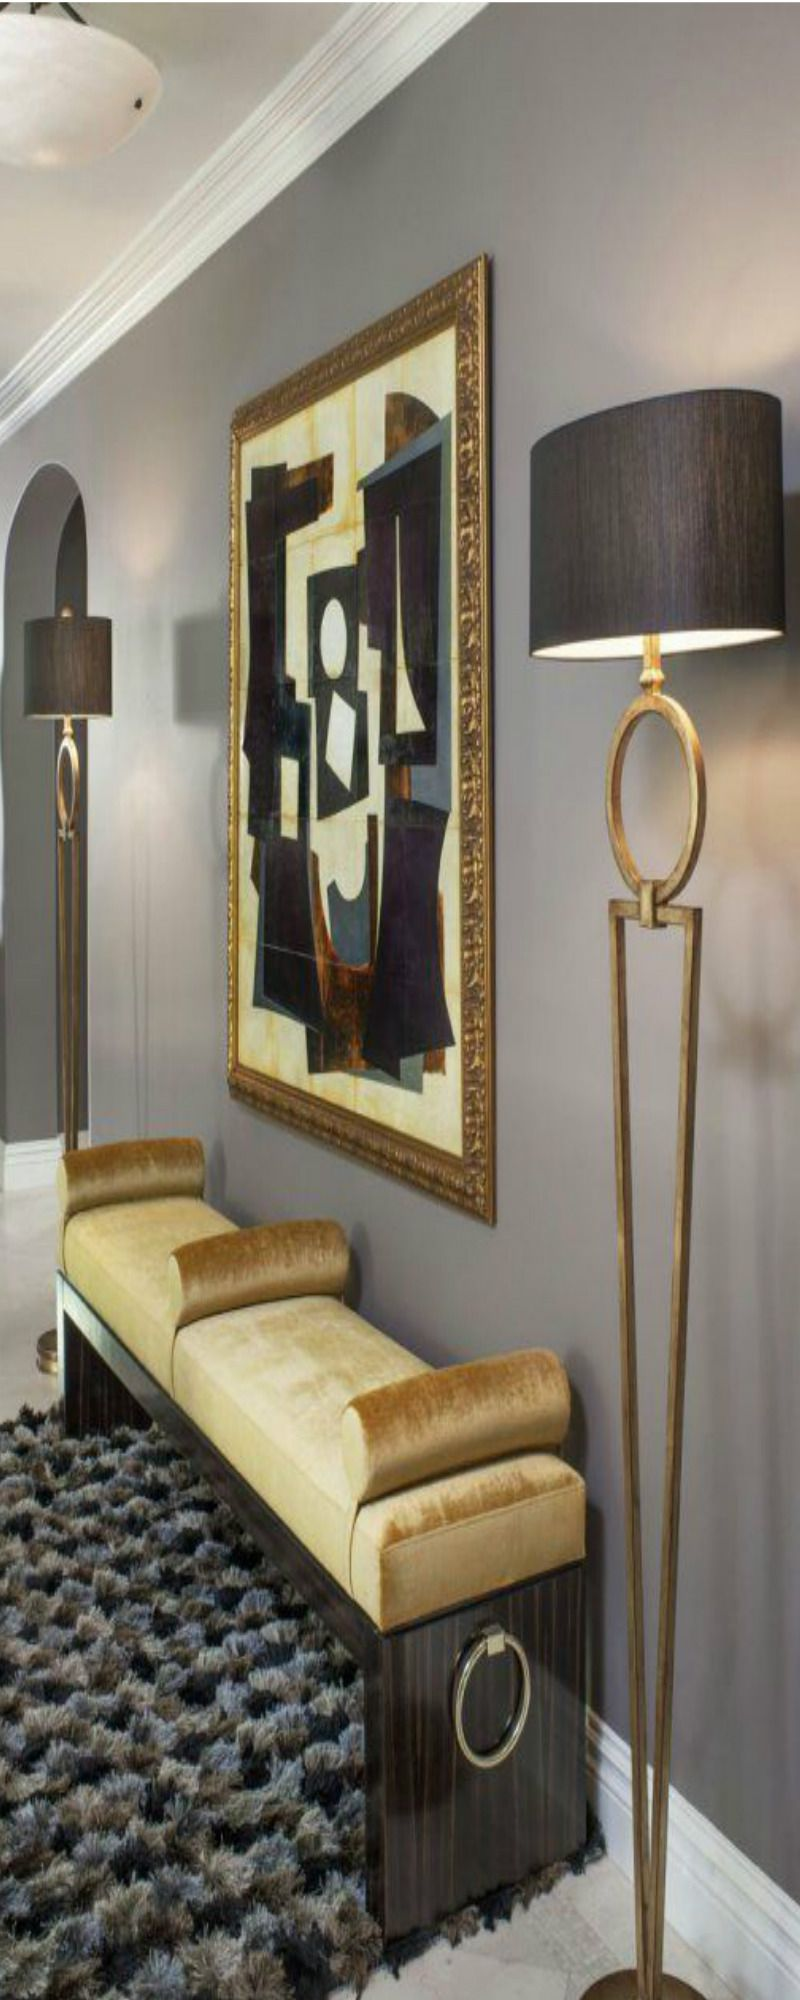 Contemporary hallway ideas  Pin by Liveyourdreams  on  ENTRYWAY Decratins  Pinterest